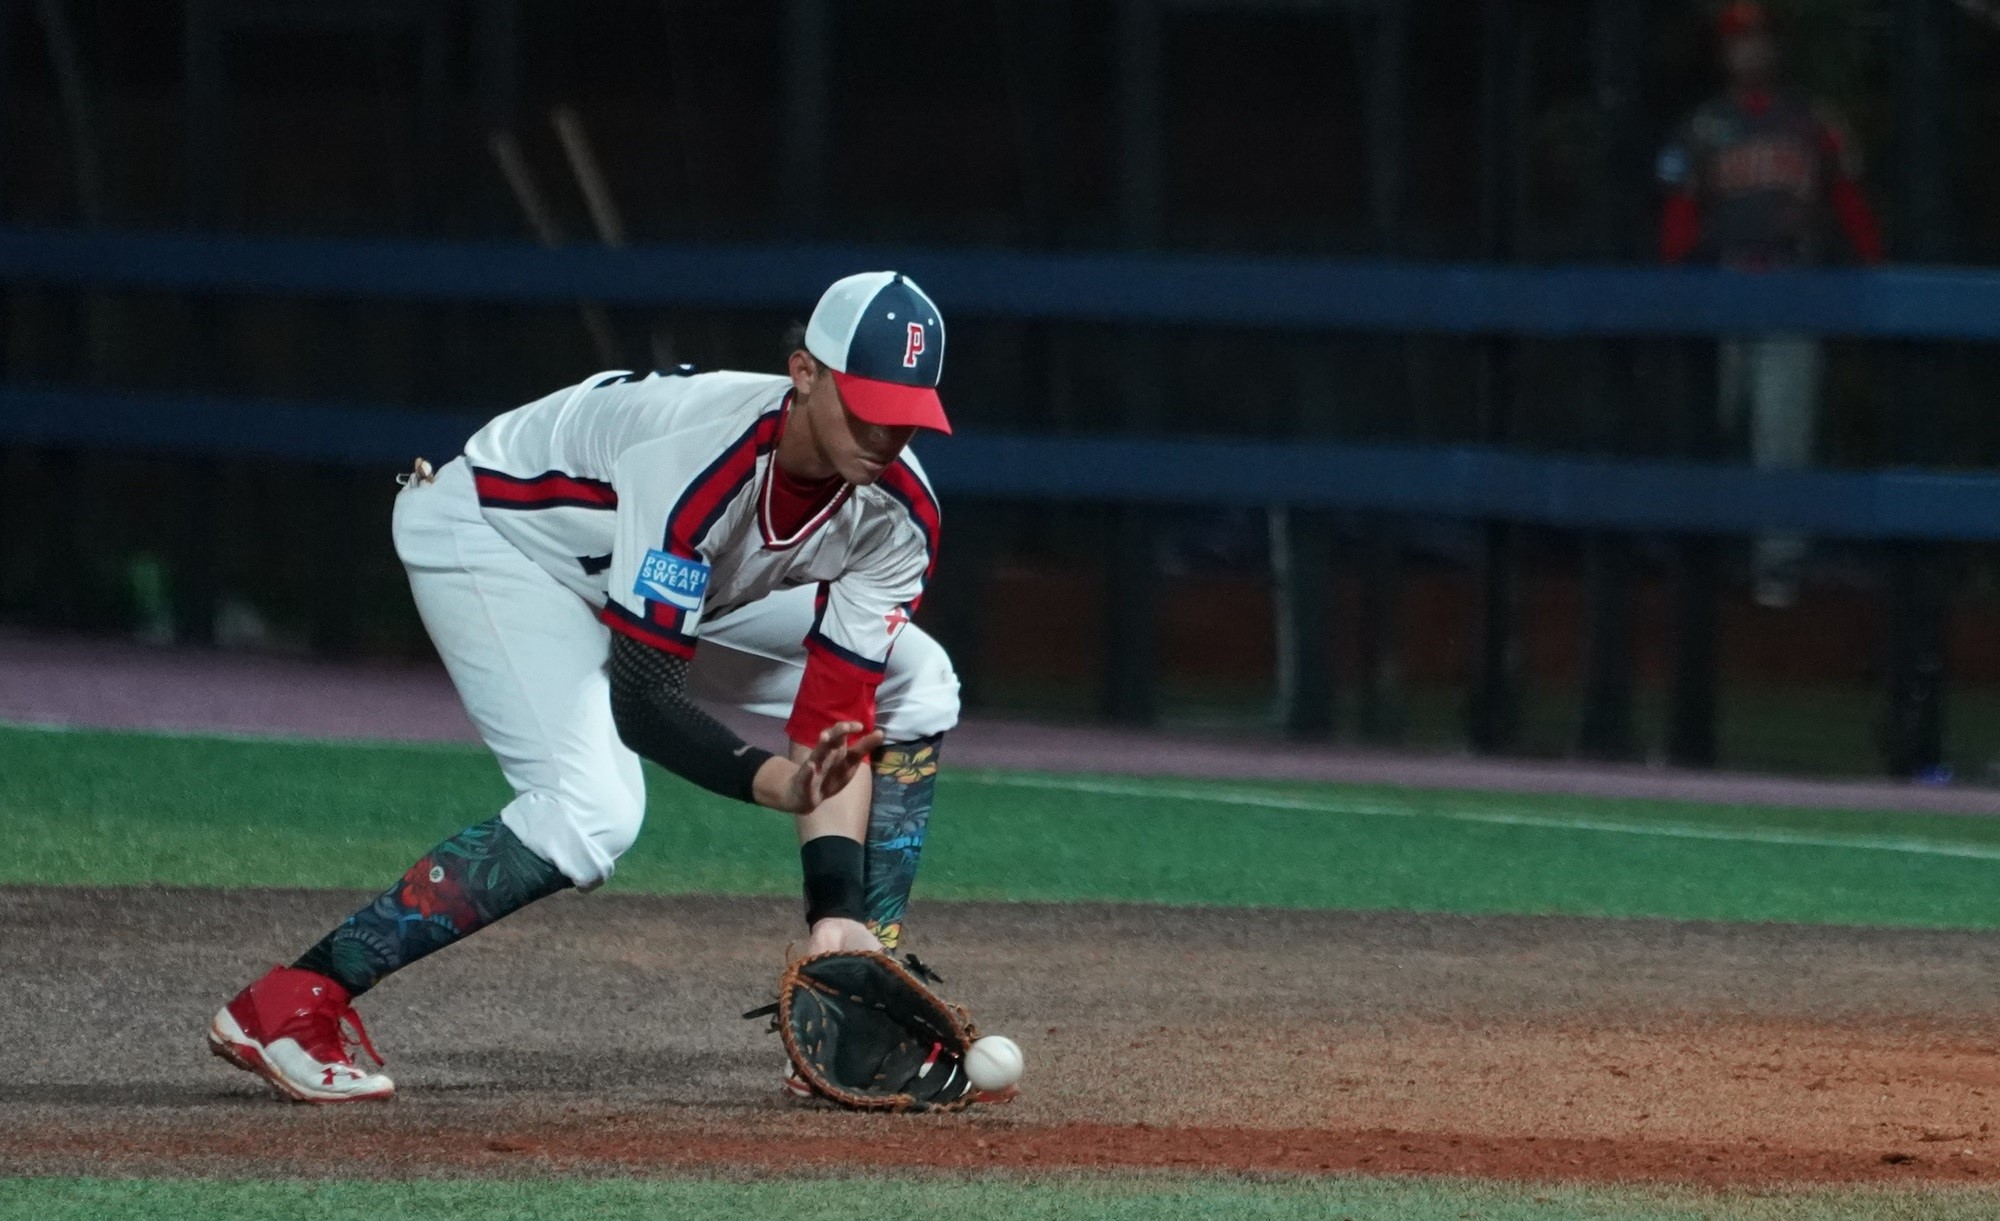 Panama's first baseman Adrian Sugastey